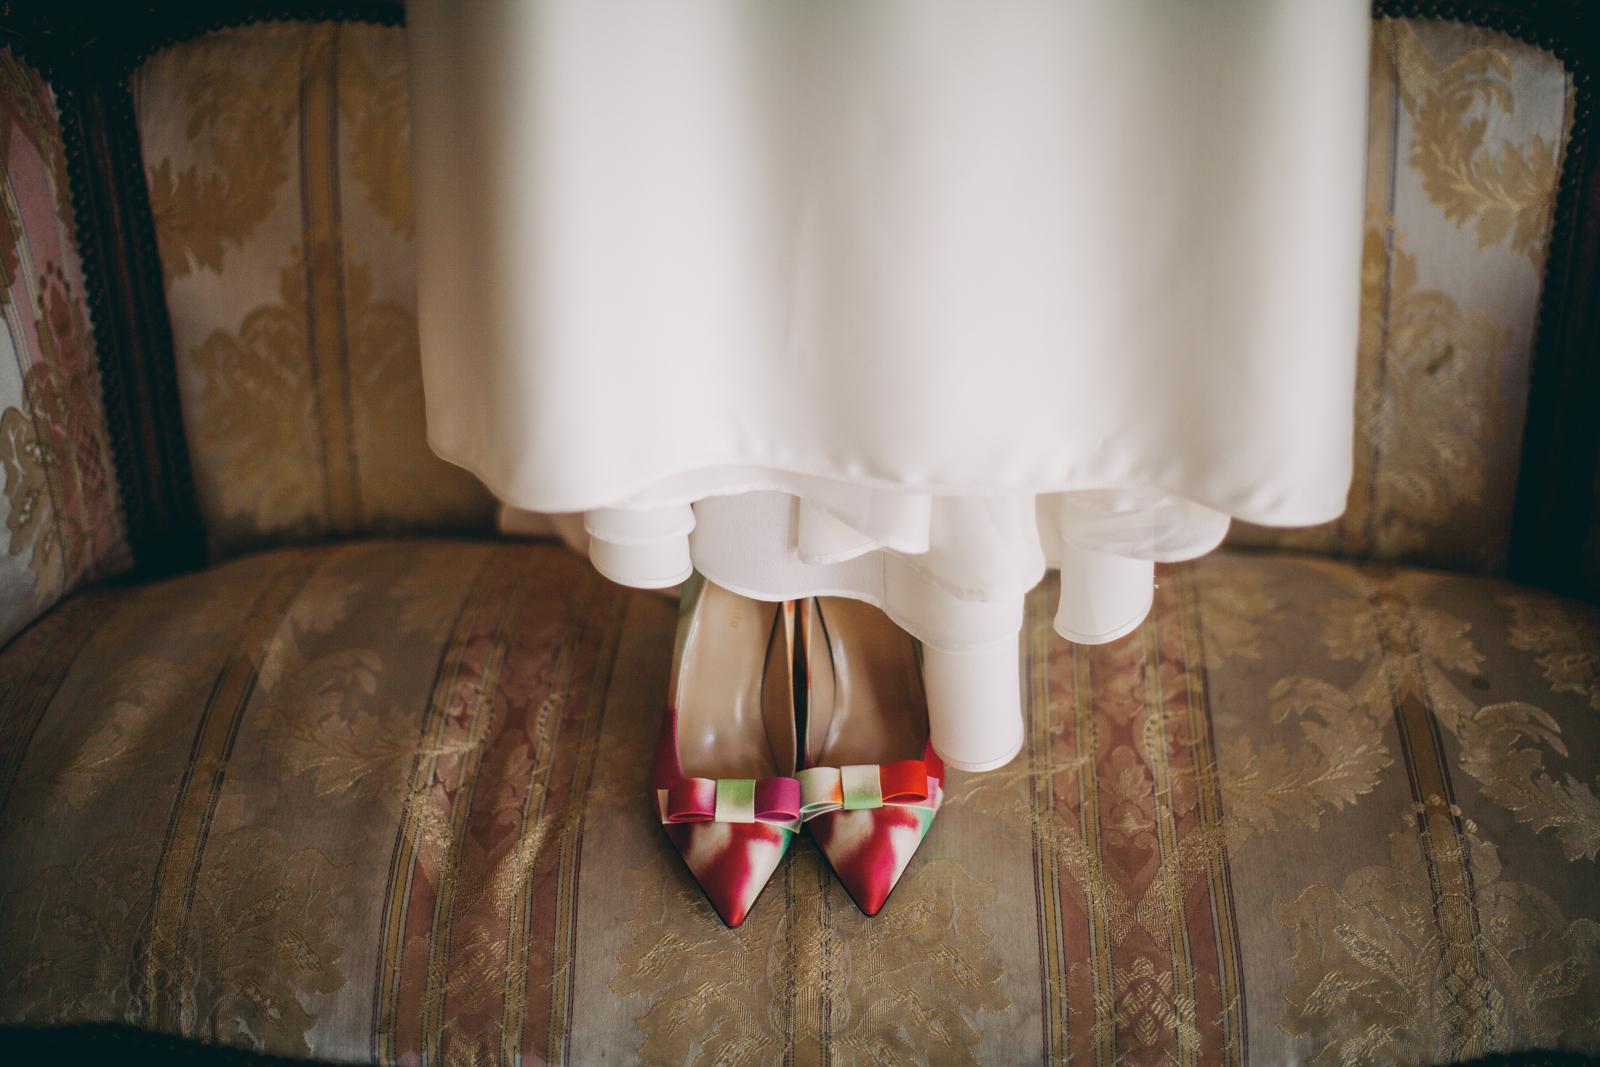 kohl_manison_wedding_photography_sarah_eric_ebony_siovhan_bokeh_photography_003.jpg